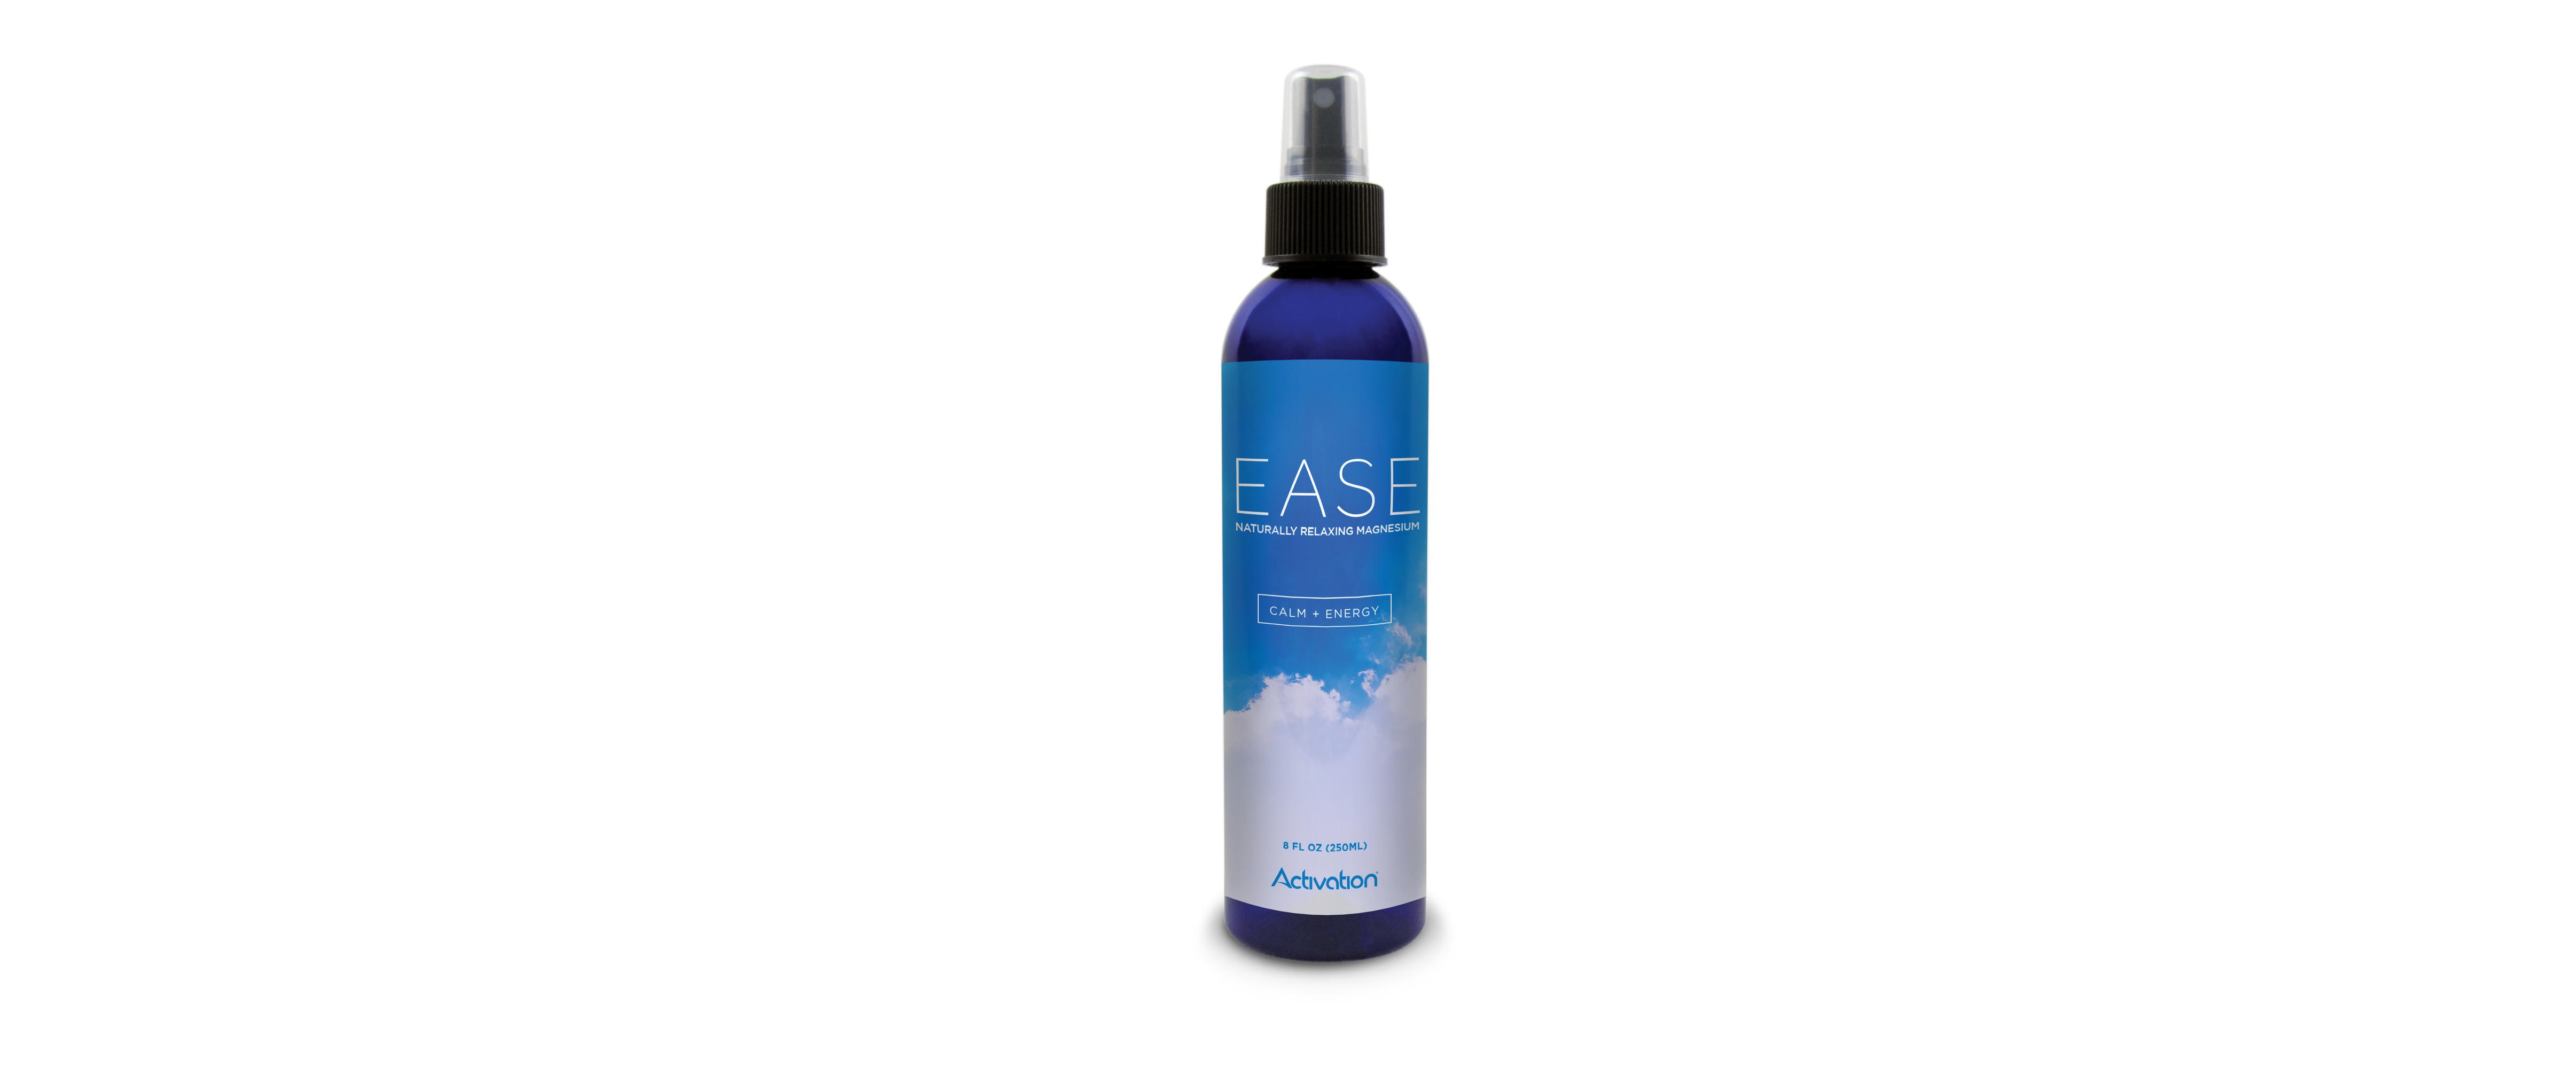 ease-250ml-bottleimage-print